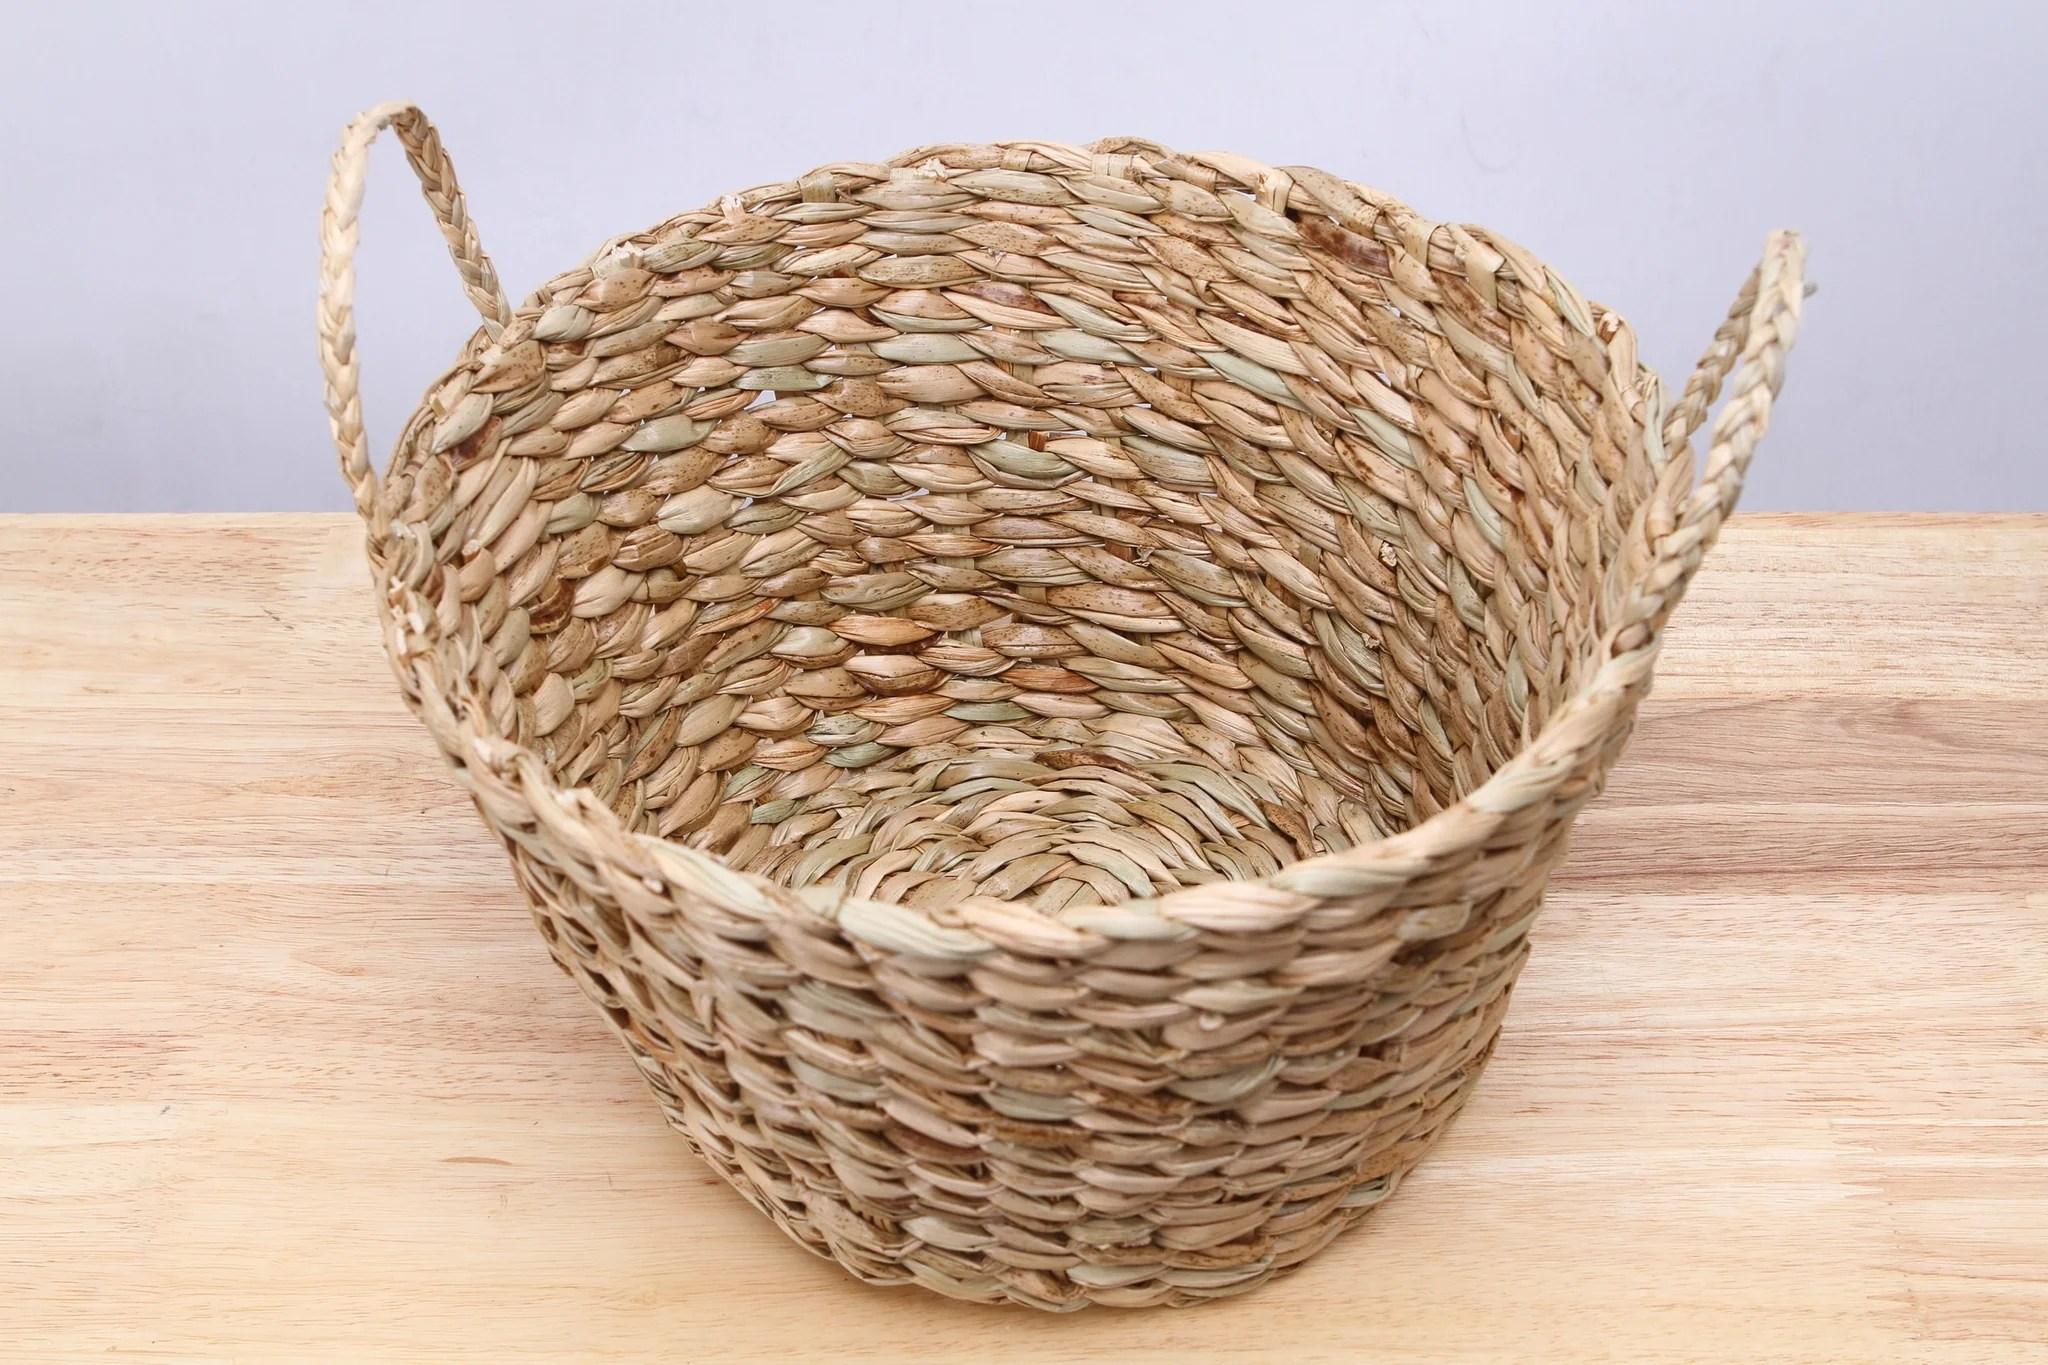 Sturdy Small Straw Wicker Basket Vtthai Small Wicker Baskets Ikea Small Wicker Baskets Lids baby Small Wicker Baskets